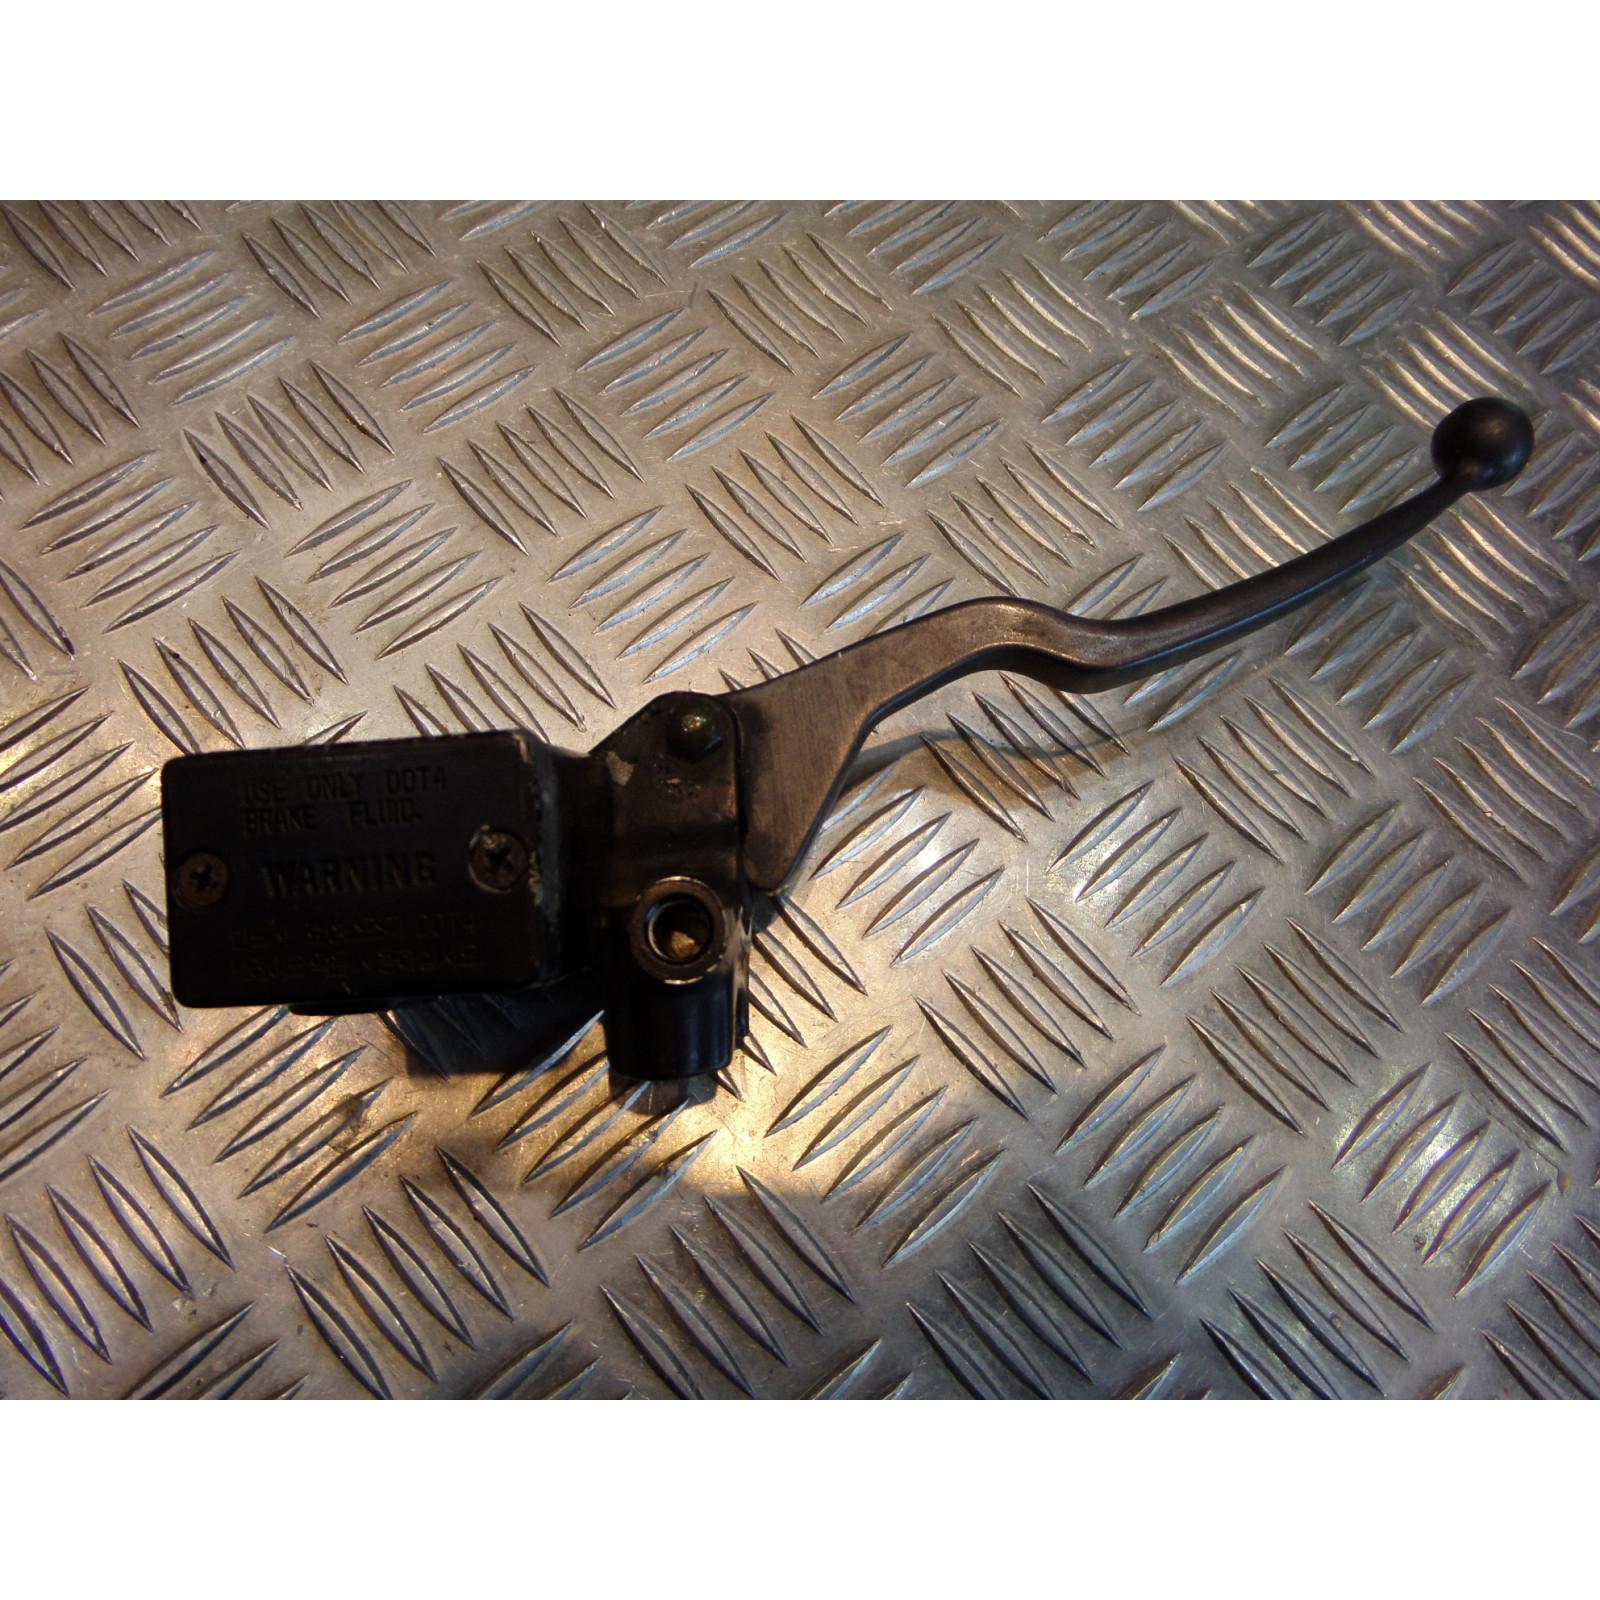 maitre cylindre frein avant moto hyosung rt 125 karion sf41a 2004 - 06